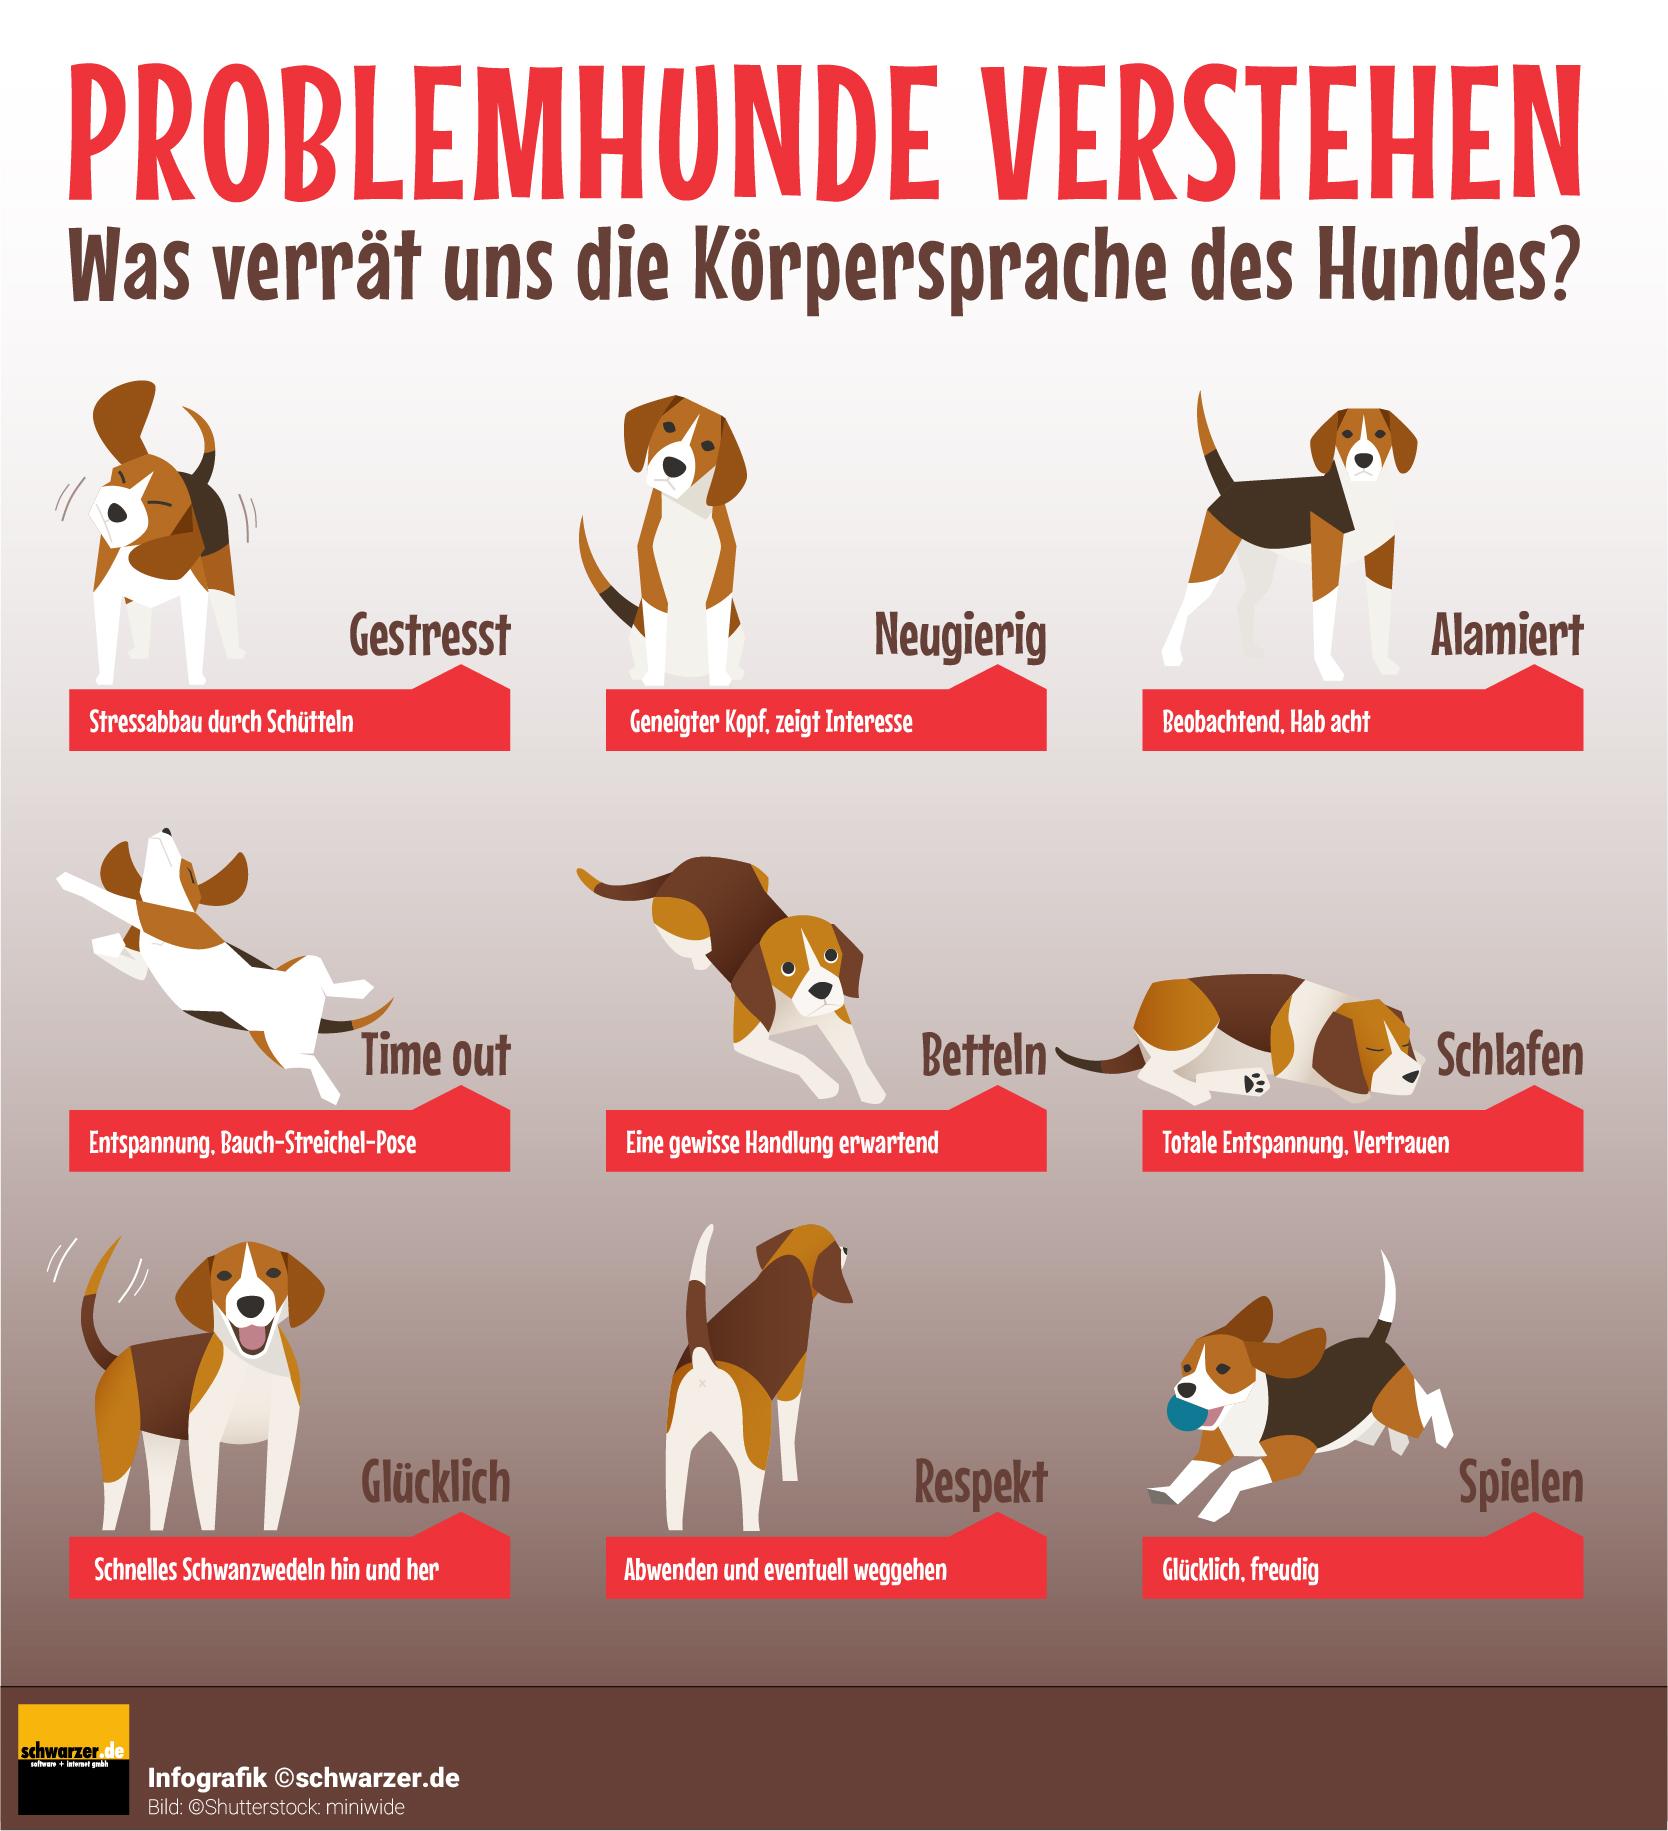 Infografik: Was verrät die Körpersprache des Hundes?